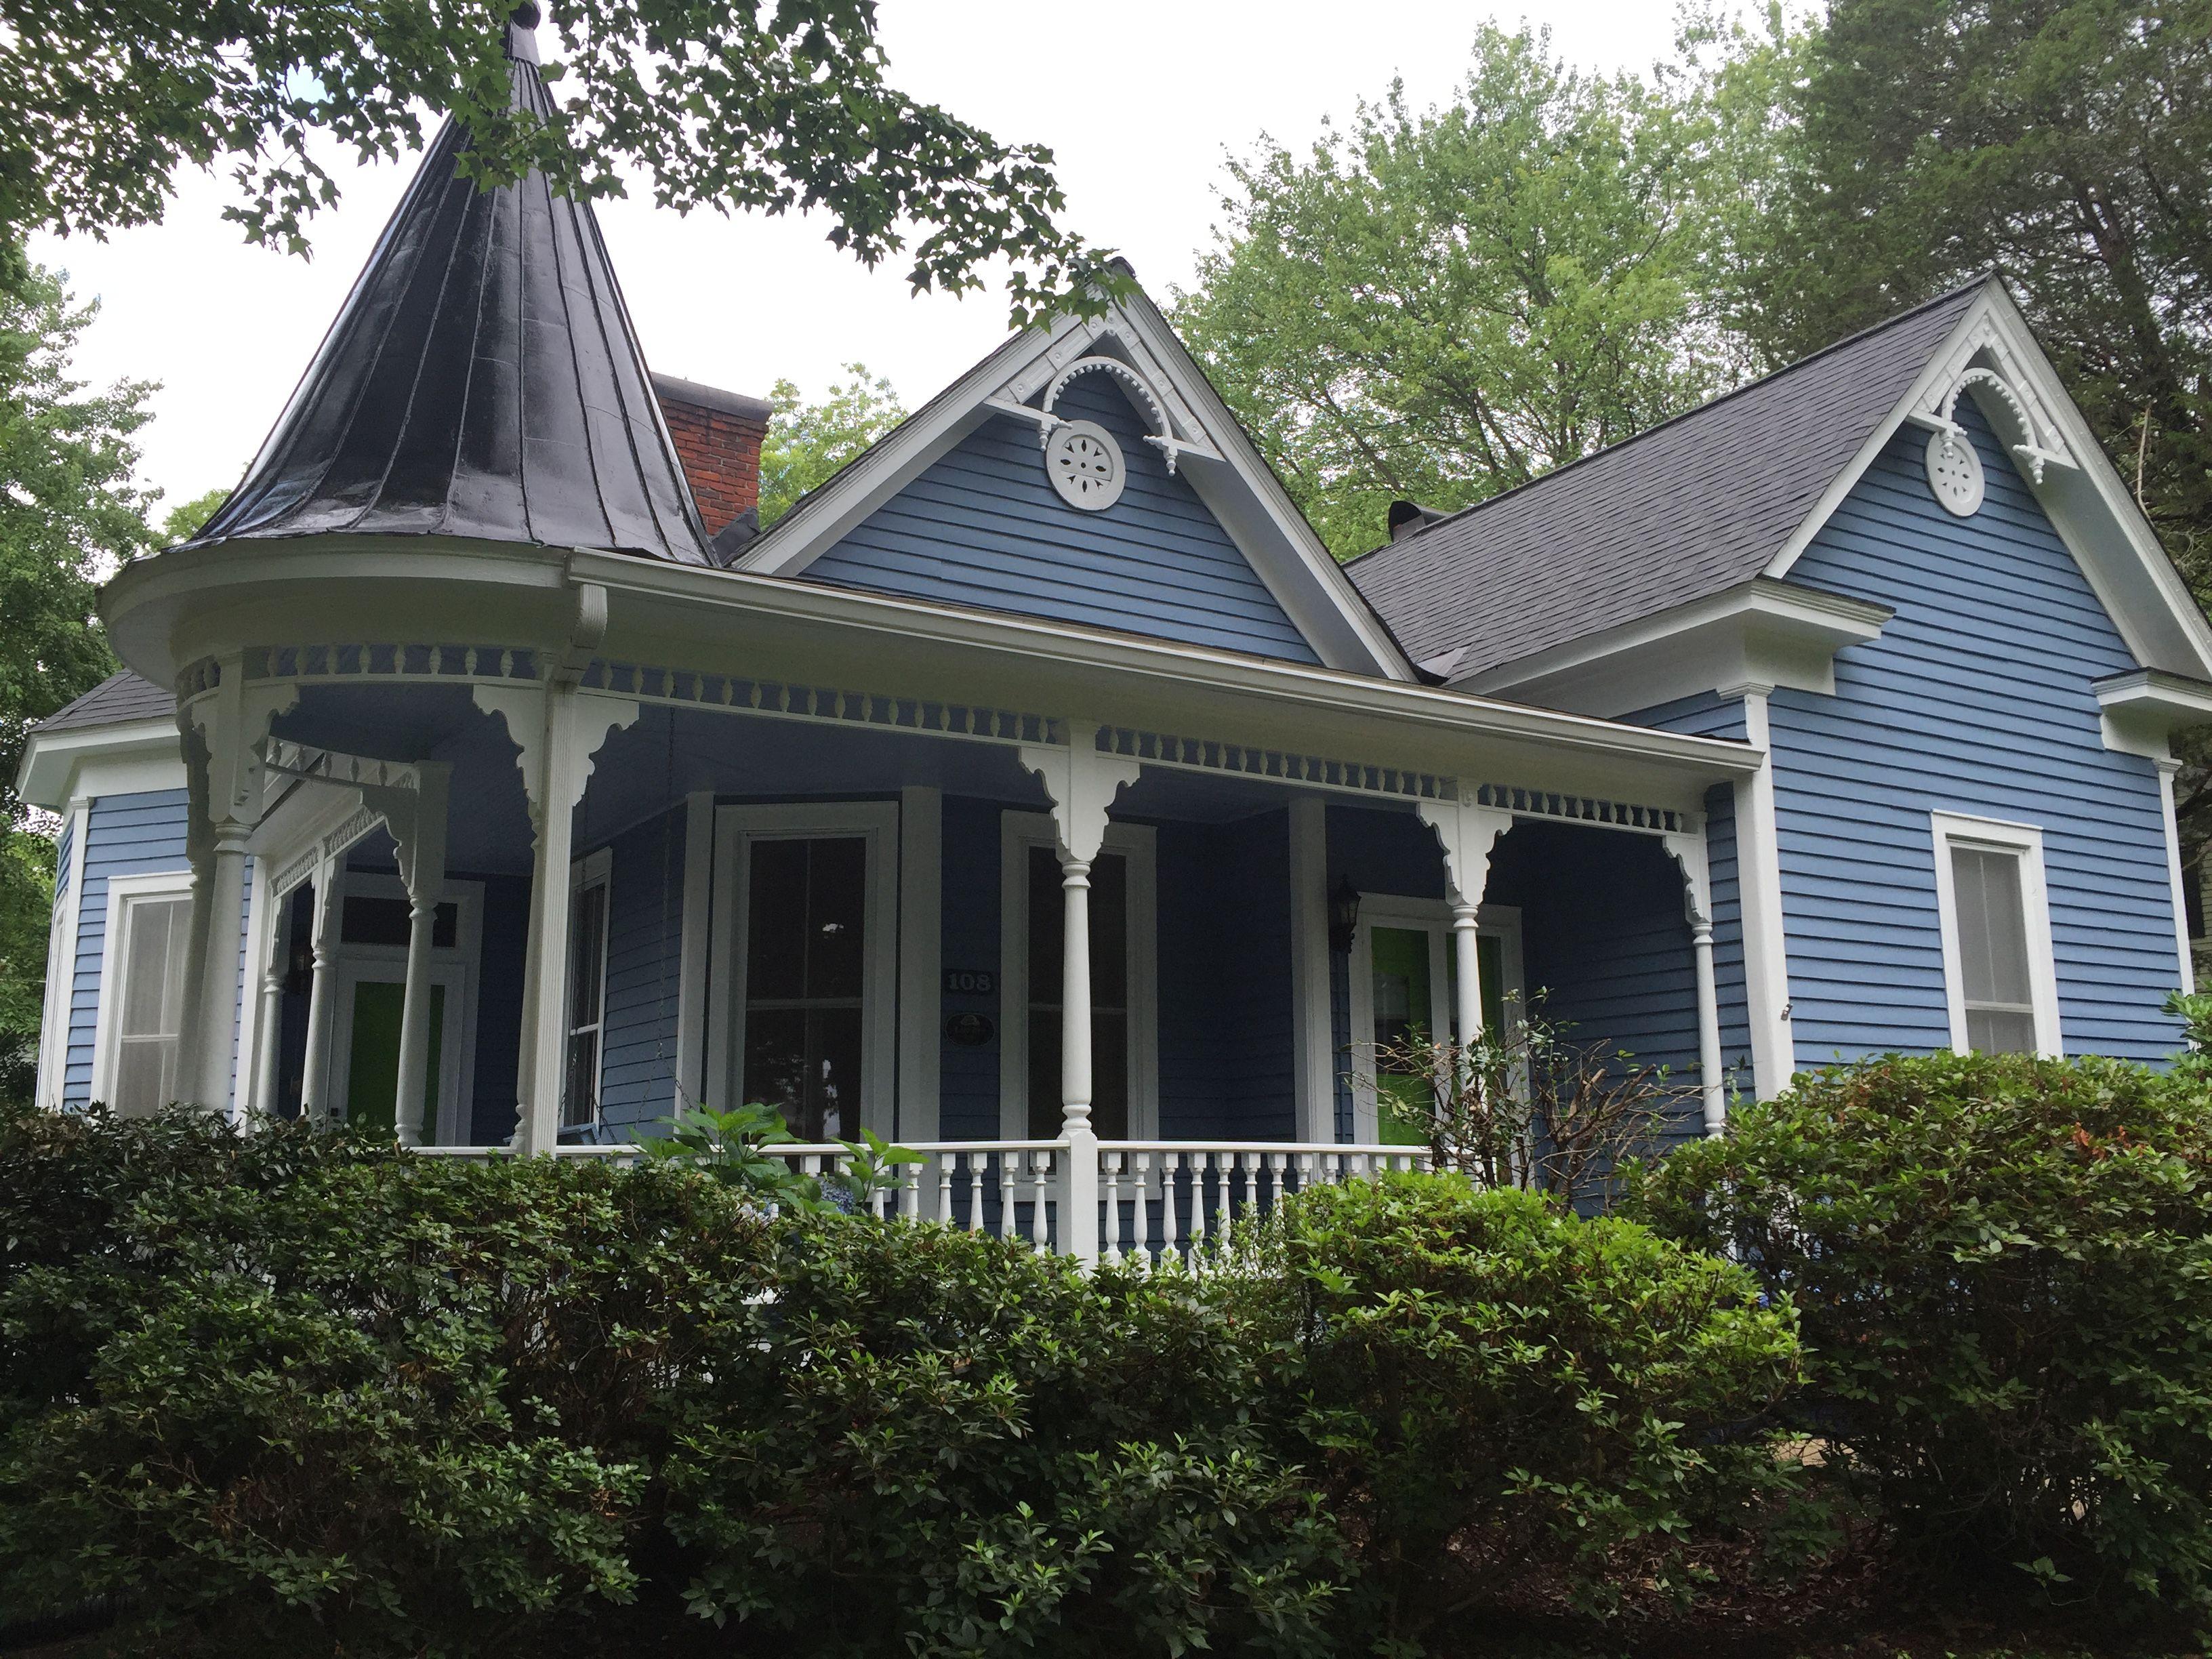 Sherwin williams basket beige exterior - House Color Smoky Azurite Sherwin Williams Exterior